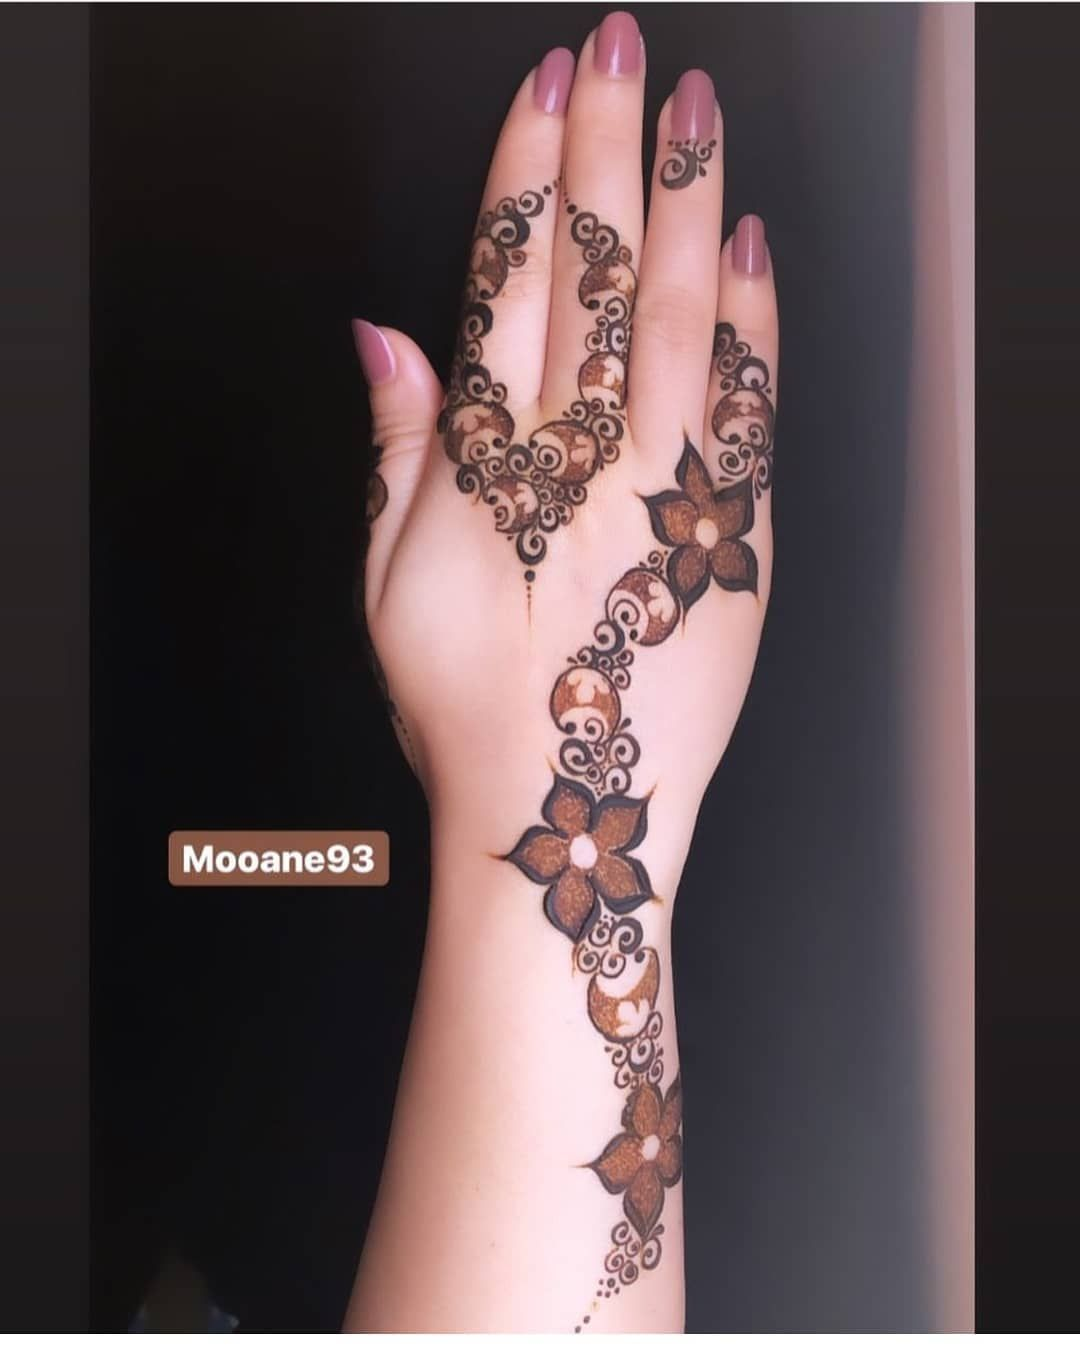 نقشات حنا جميله بوتيك الحوريه موديلات مرره تجنن واسعارها خفيفة ع الجيب Bout Mehndi Designs For Hands Mehndi Designs For Fingers Floral Henna Designs